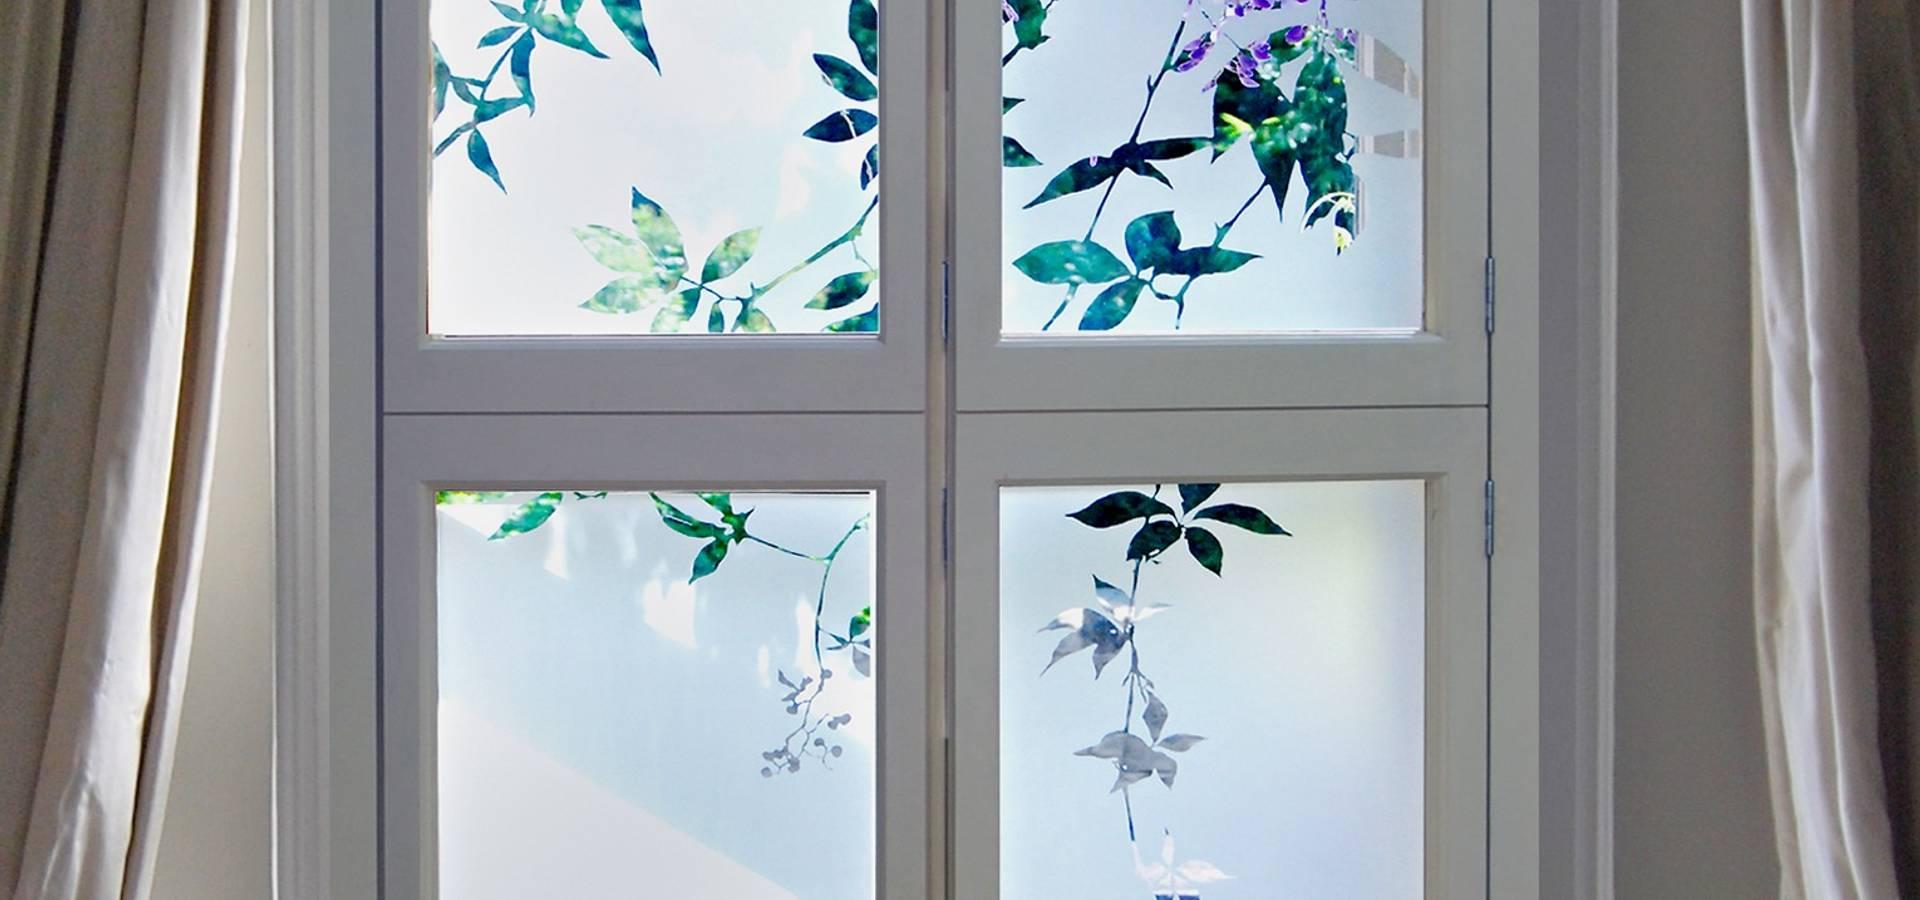 Antonia Macgregor Designs in Glass